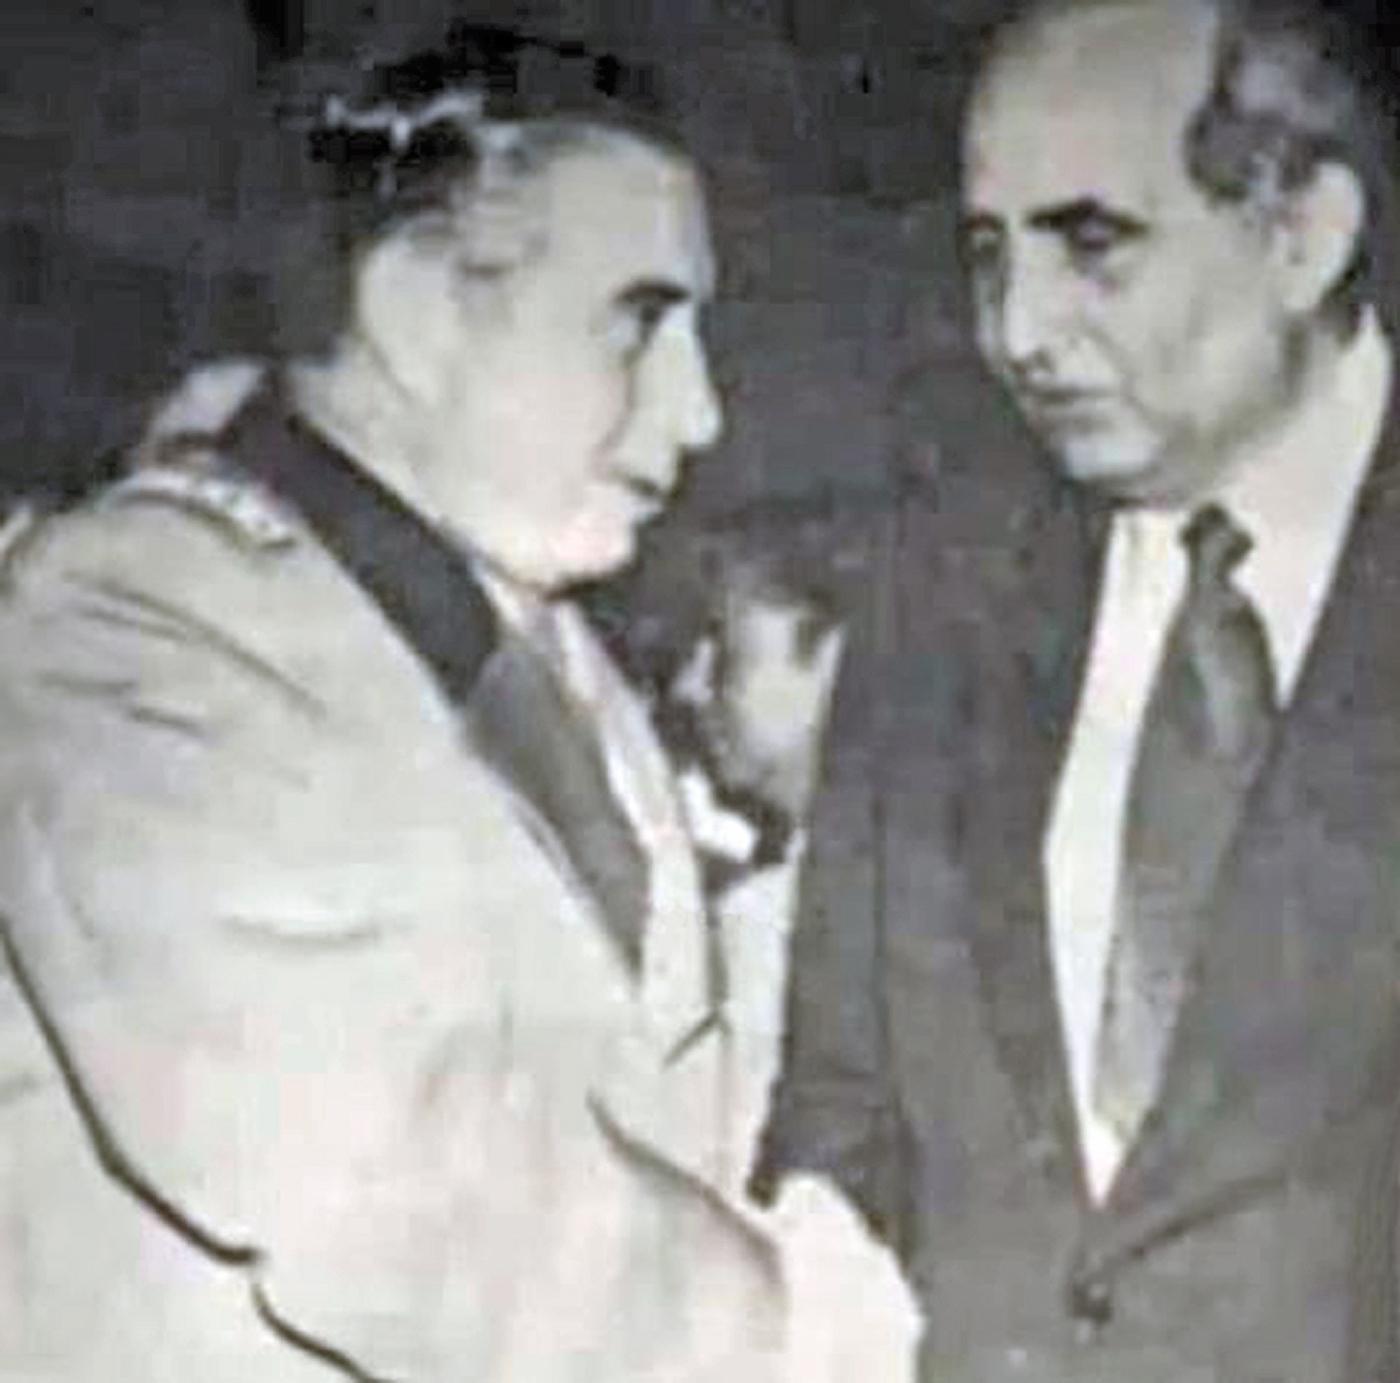 LAS COMPLICIDADES DE AGUSTIN EDWARDS, PRESIDENTE DE PAZ CIUDADANA.